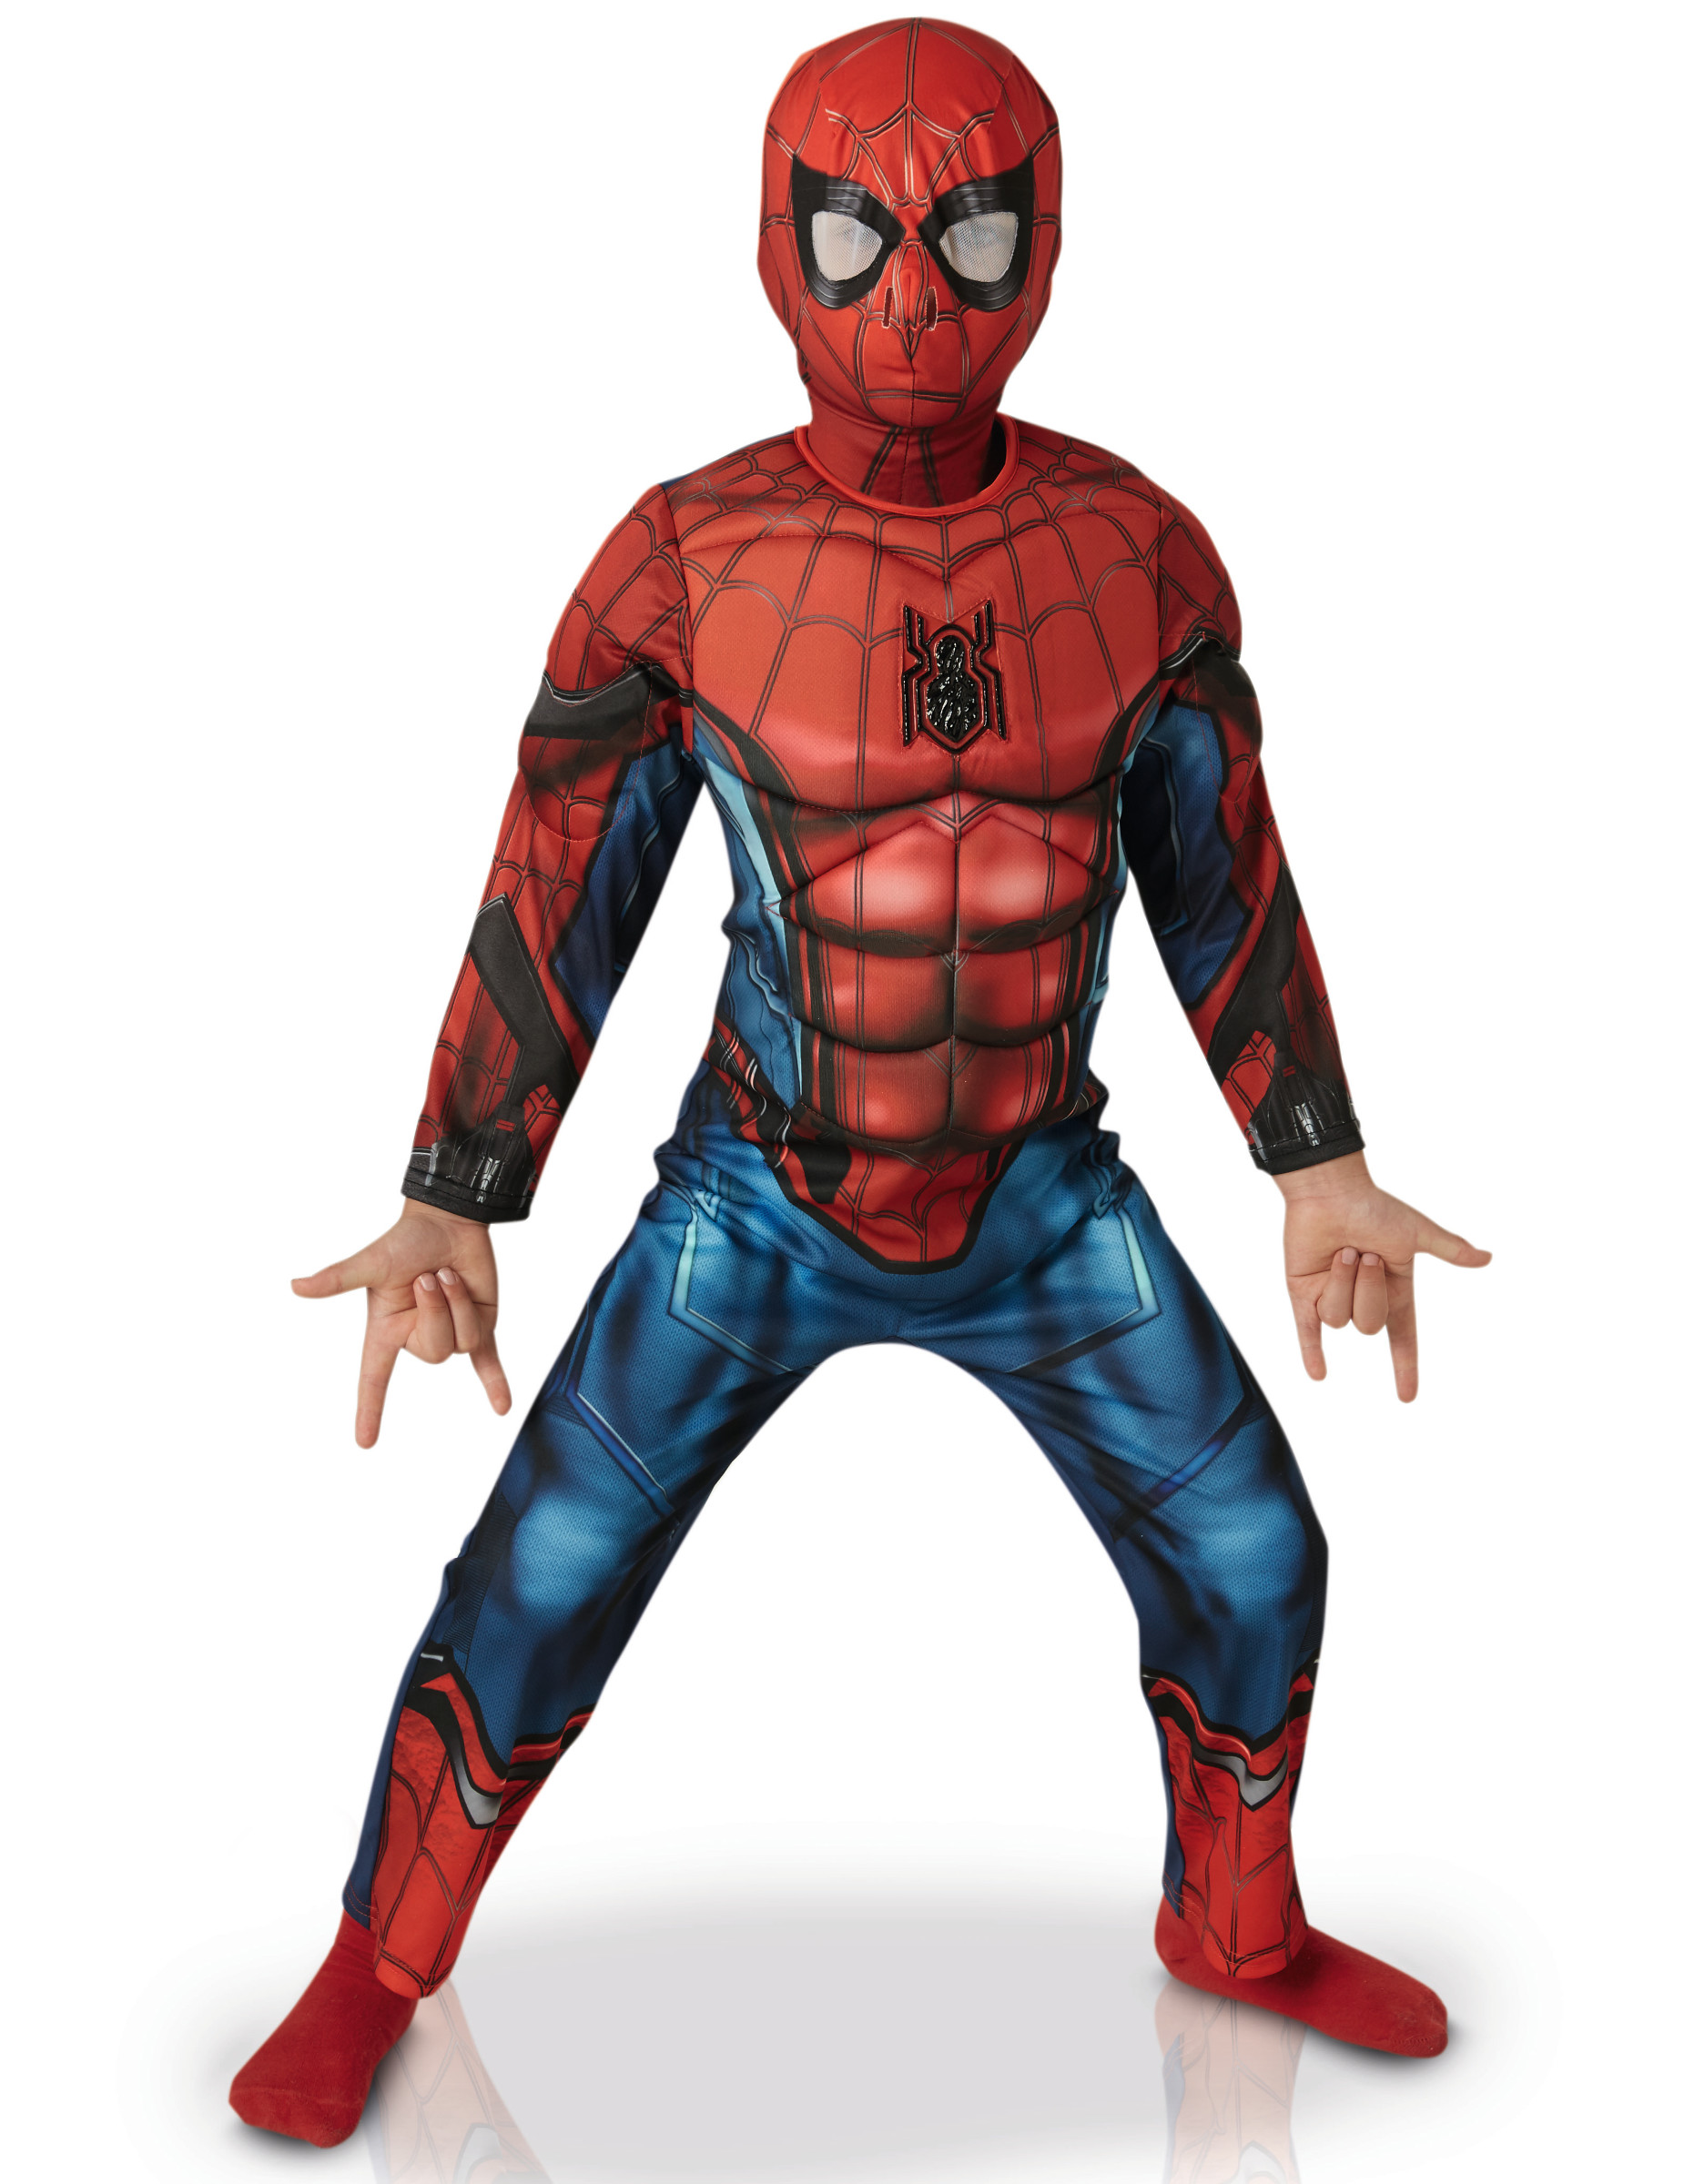 d guisement luxe spider man homecoming enfant d coration. Black Bedroom Furniture Sets. Home Design Ideas